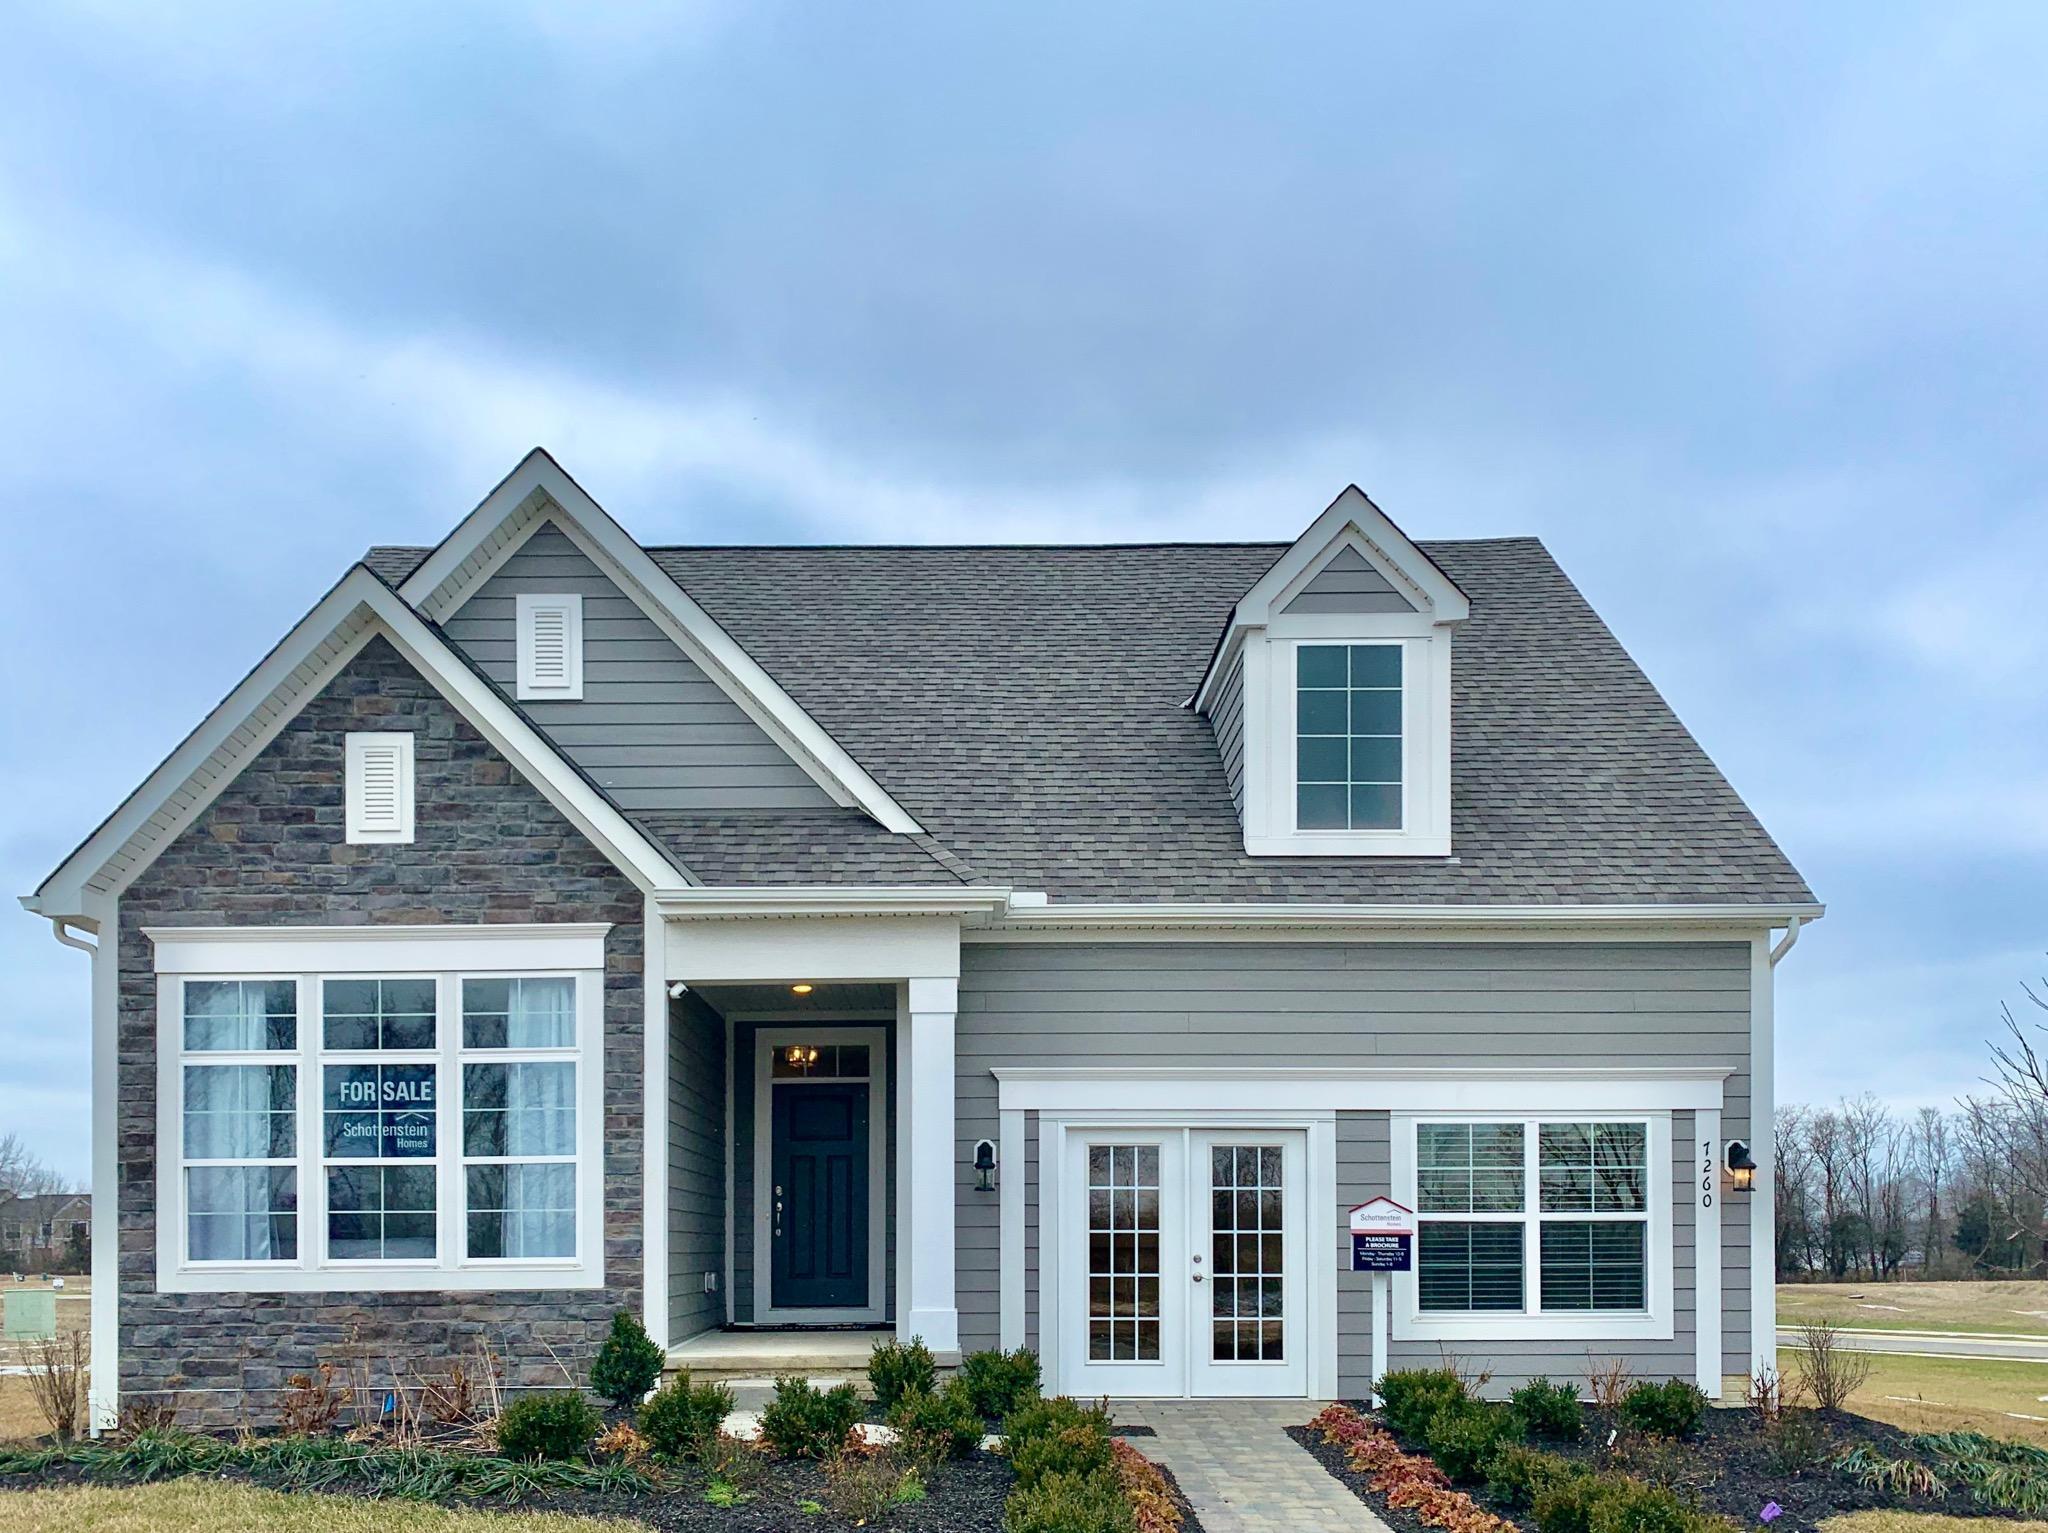 7260 Whimbrel Lane, Sunbury, Ohio 43074, 3 Bedrooms Bedrooms, ,4 BathroomsBathrooms,Residential,For Sale,Whimbrel,220001553